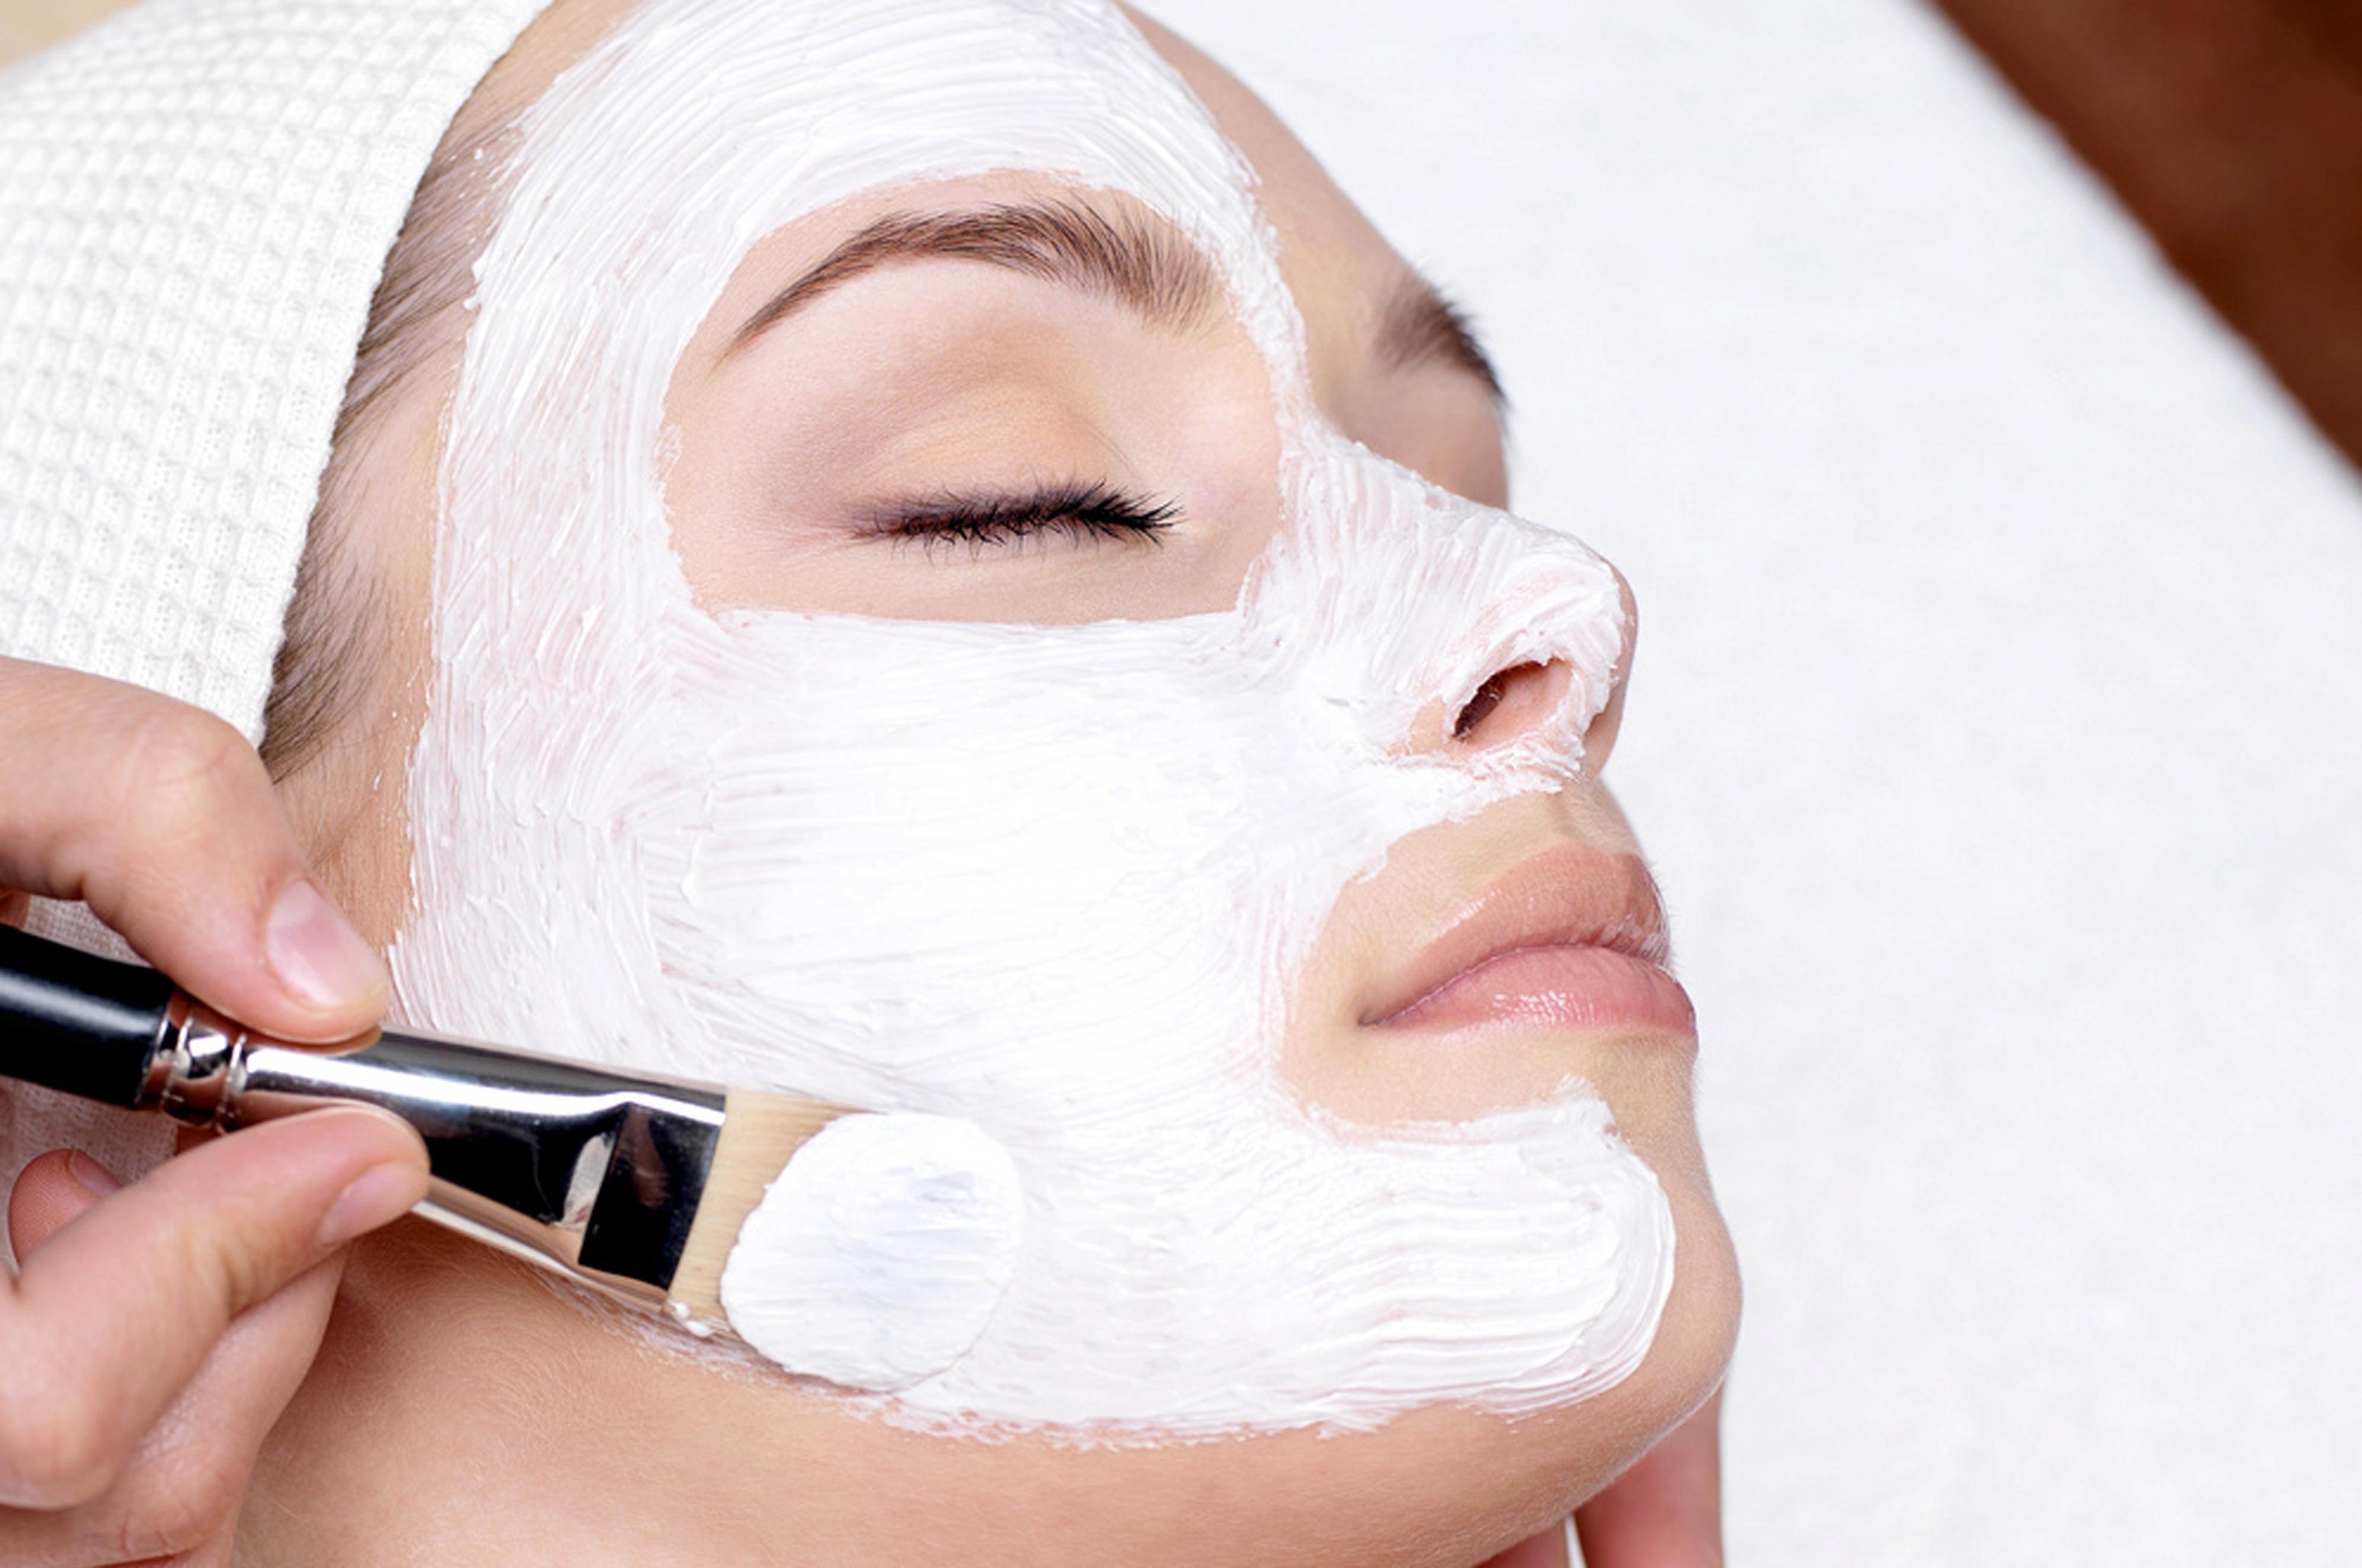 Seberapa Efektif Overnight Sleeping Face Mask Bekerja